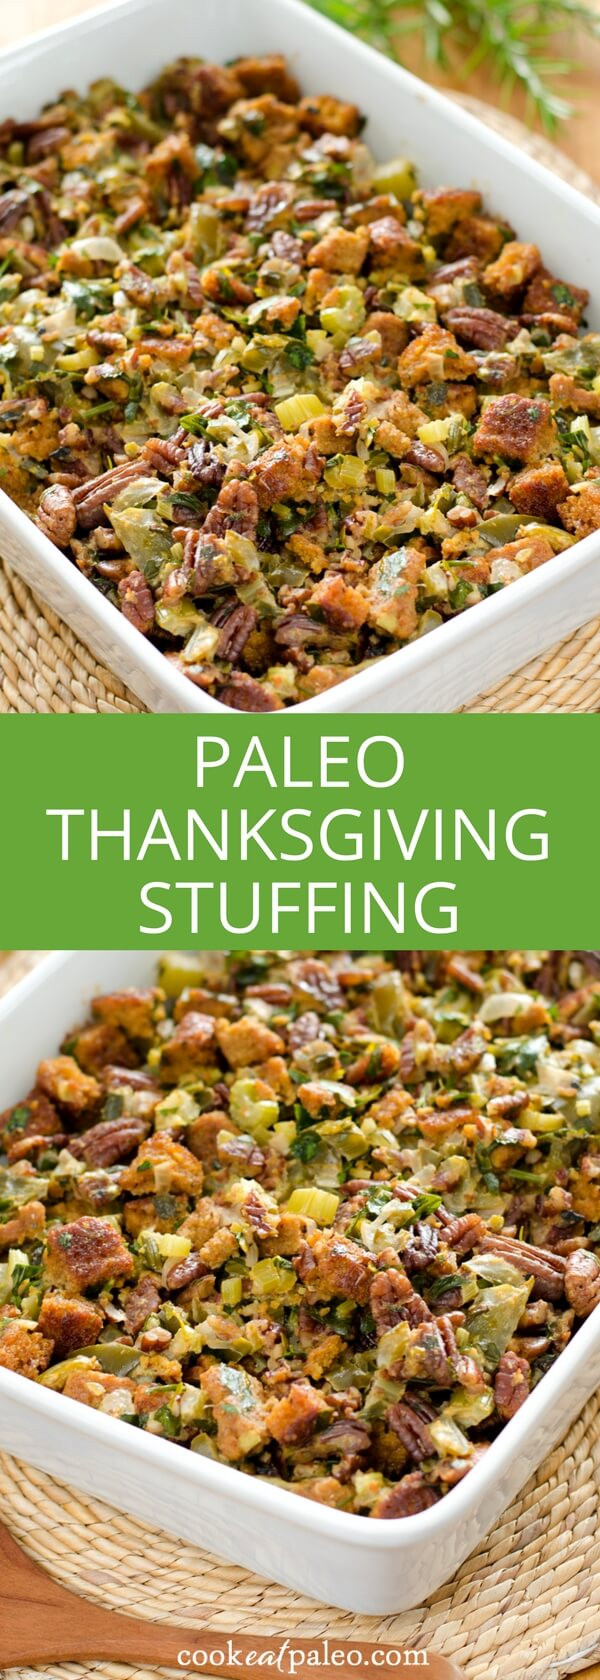 Paleo Thanksgiving Stuffing  Paleo Cornbread Stuffing Gluten Free Grain Free